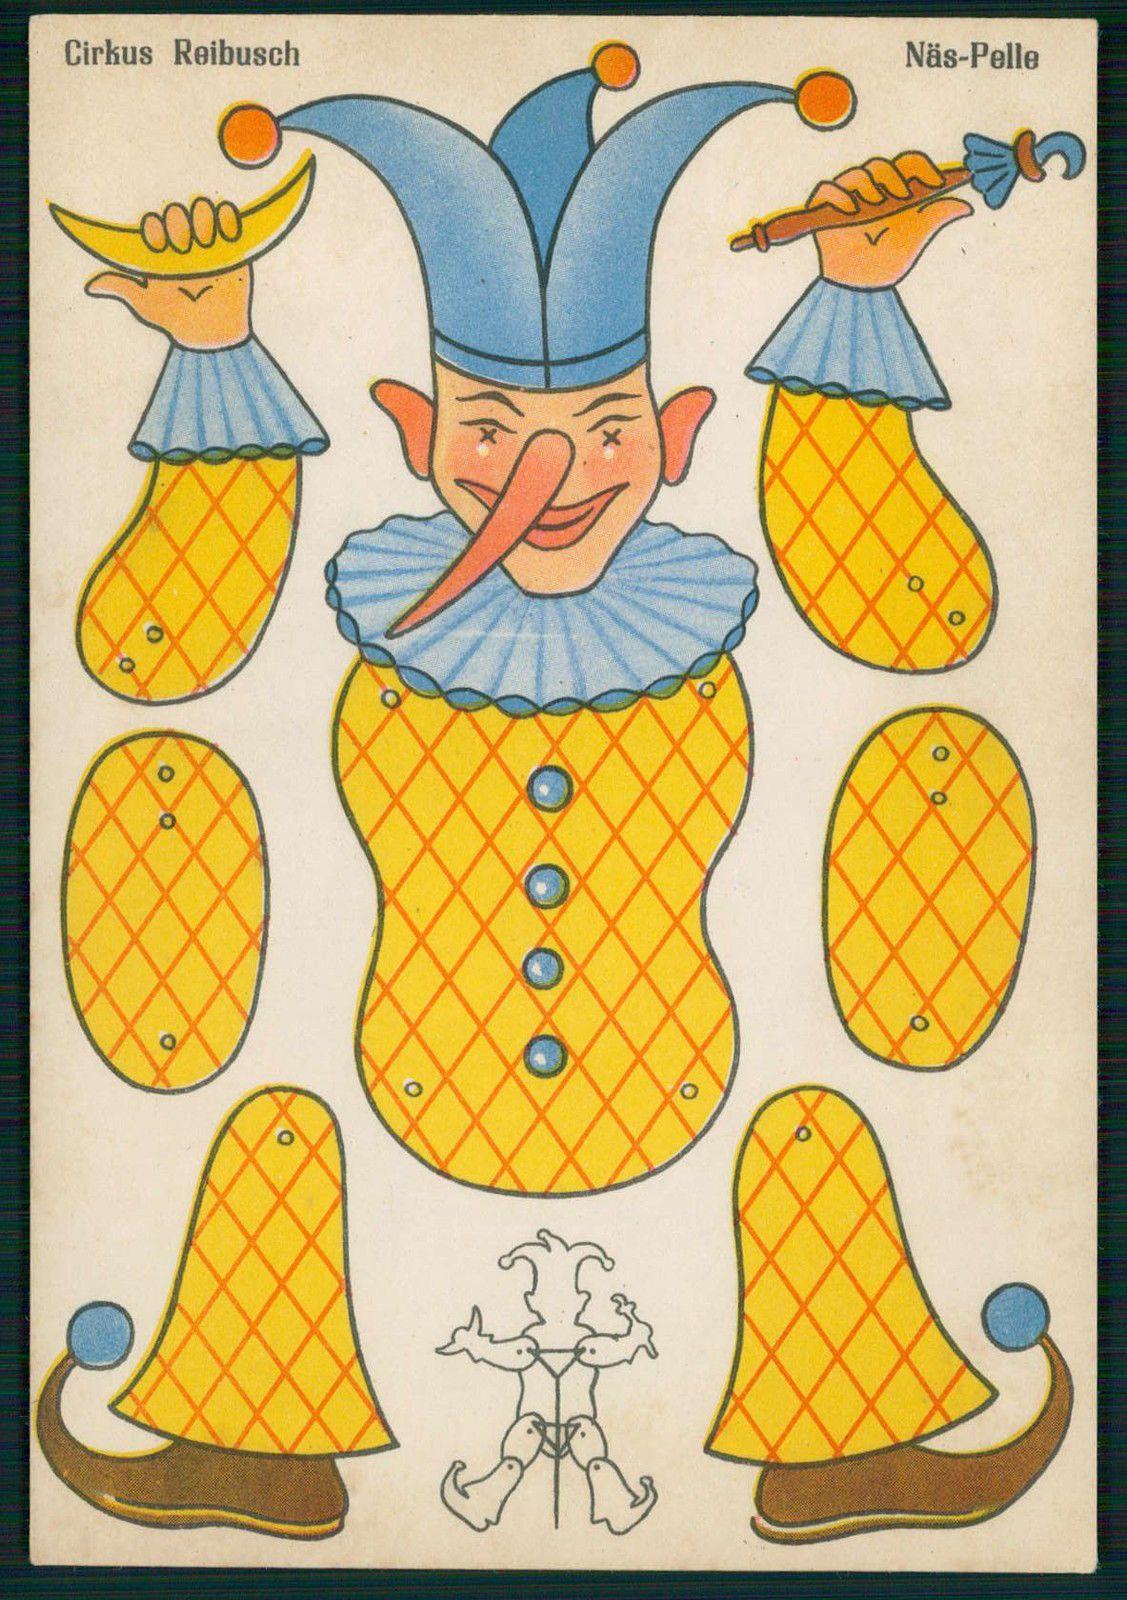 Art Paper Doll Cut Out Clown Circus Schuburg Original Old c1940s ...